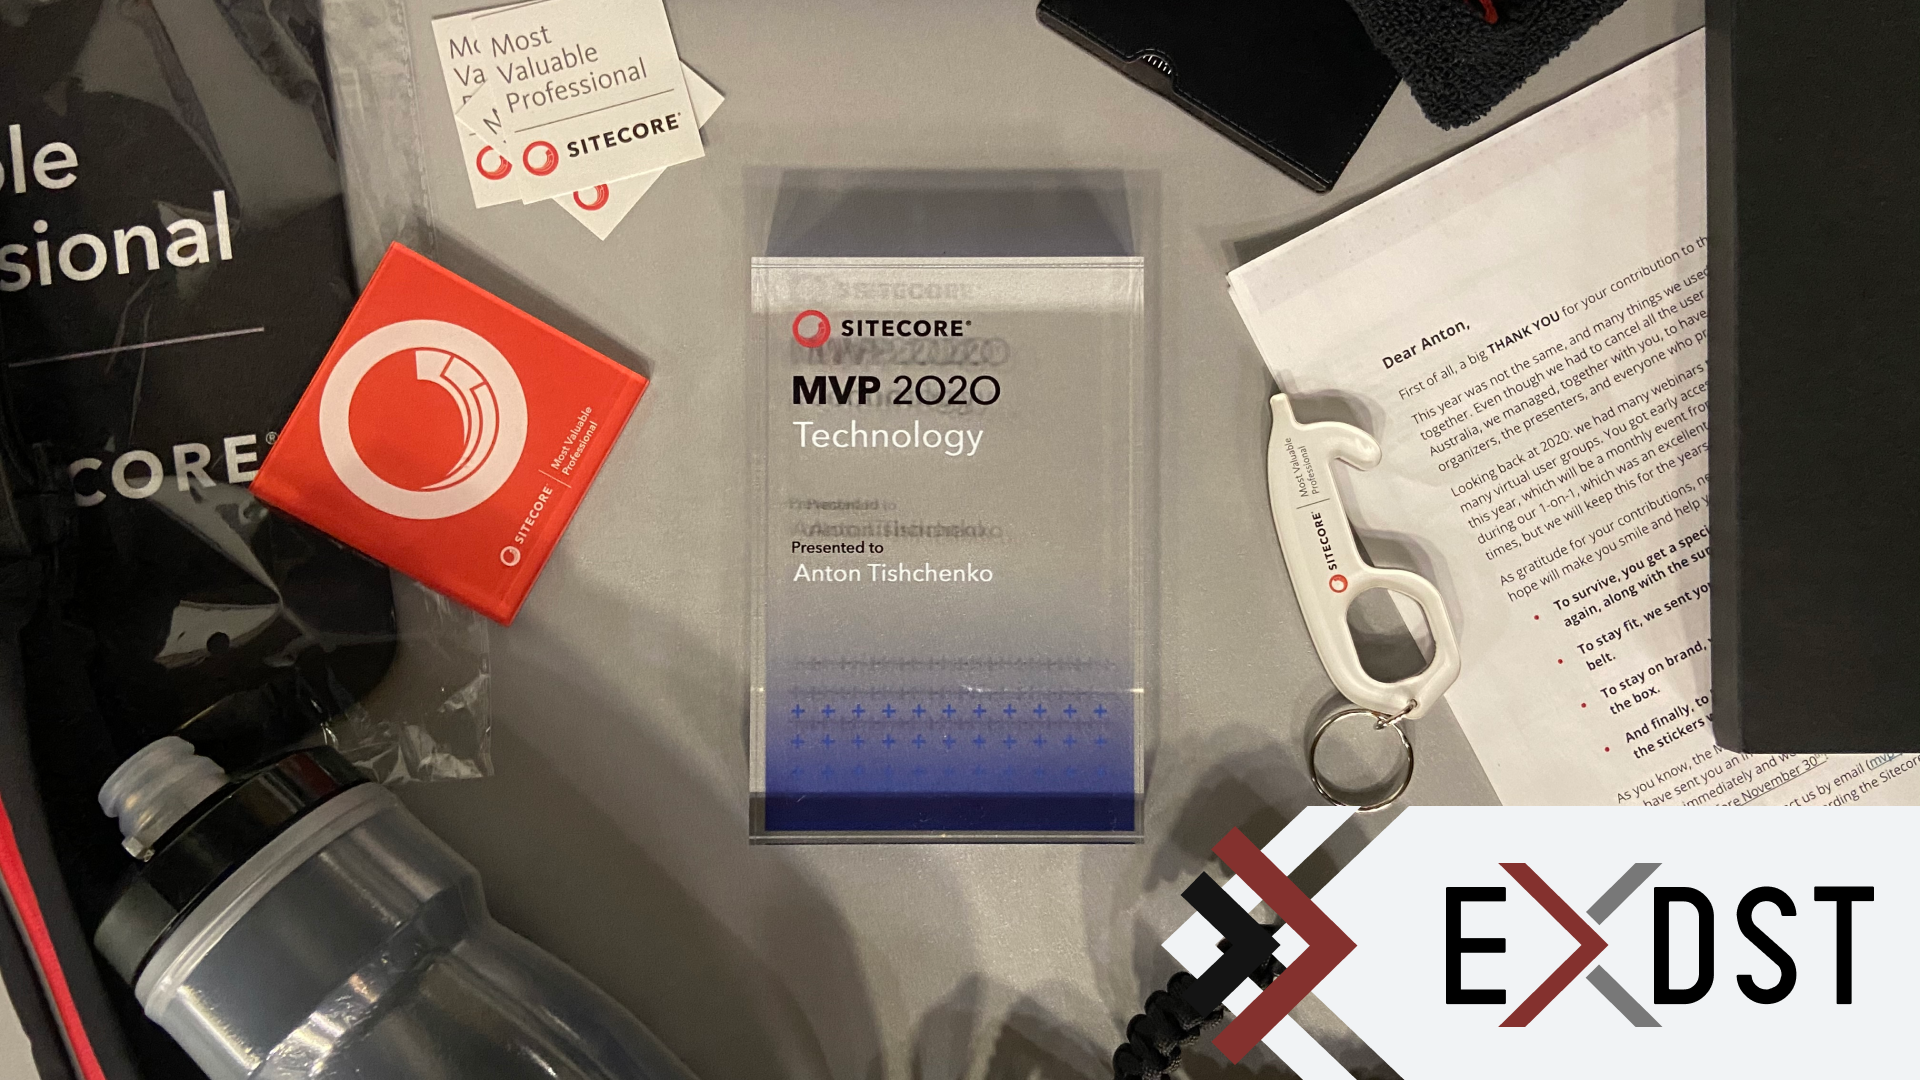 Cover Image for Sitecore MVP 2020 Award Arived to Ukraine